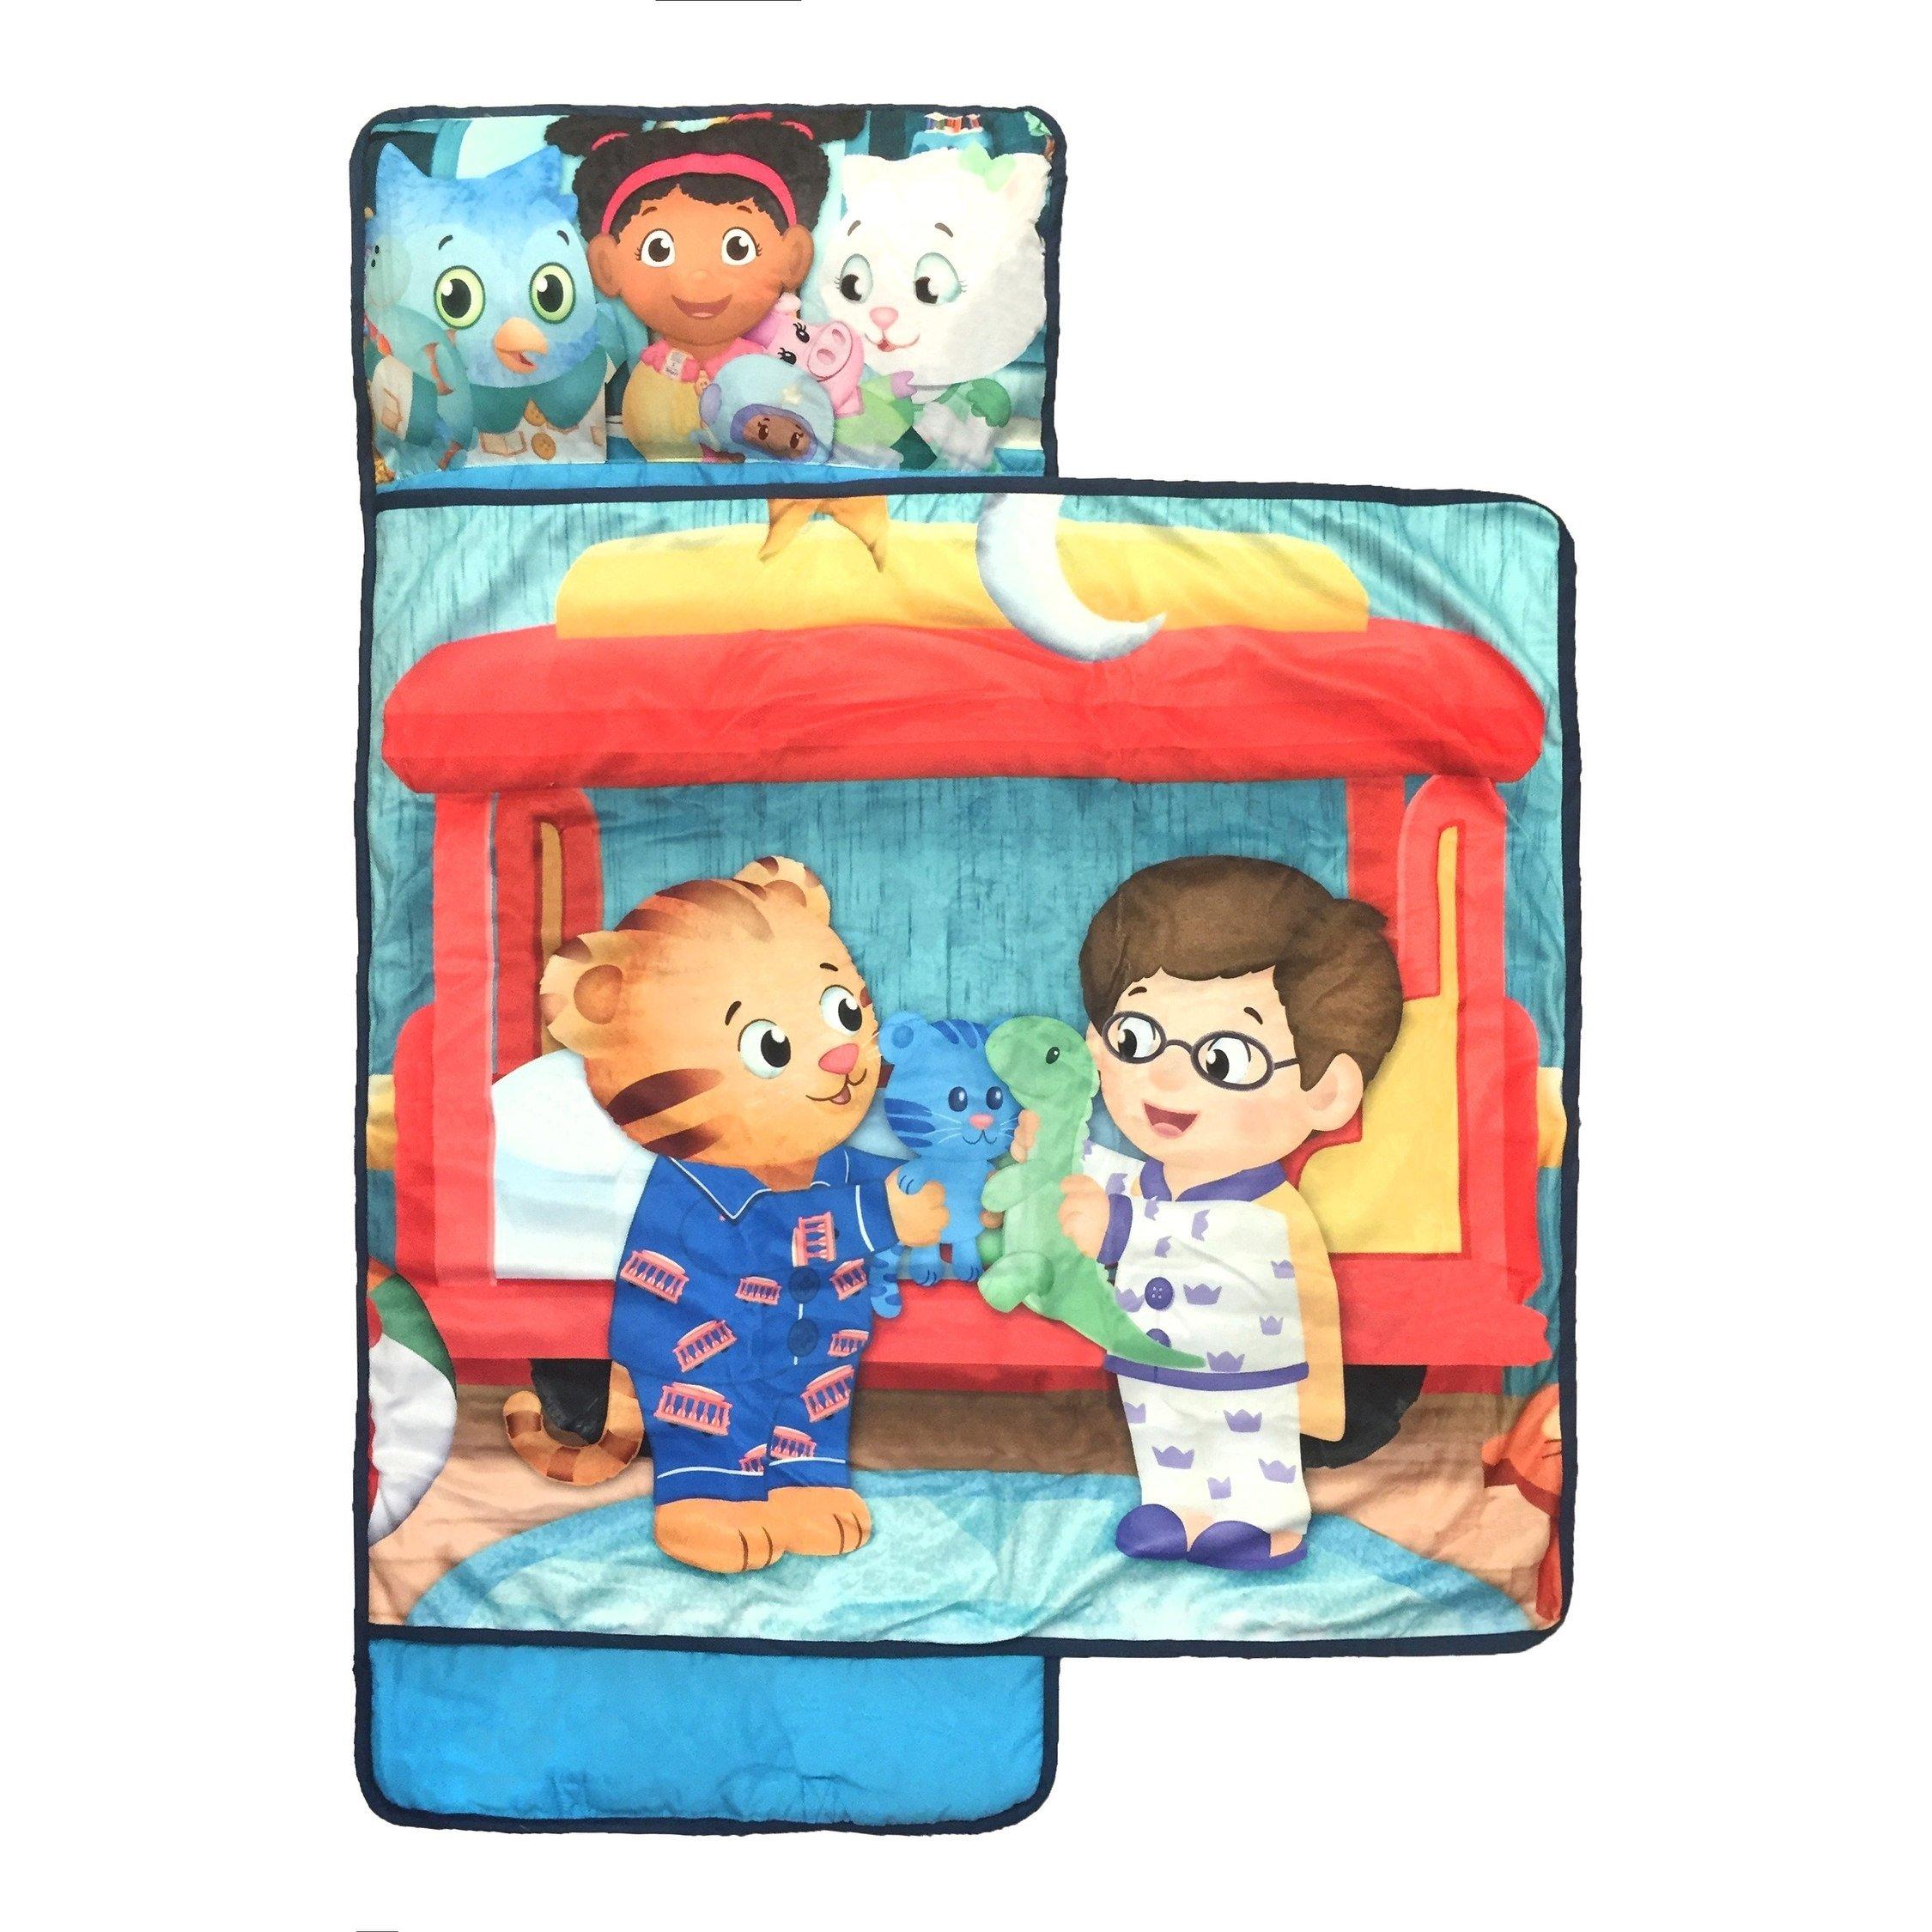 PBS Kids Daniel Tiger Cartoon Nap Sleep Mat, Fun O Owl Prince Wednesday Katerina Kittycat Character Sleeping Pad, Infant Children Sweet Dream Friendly Cartoon Roll Out Travel Bedding, Polyester